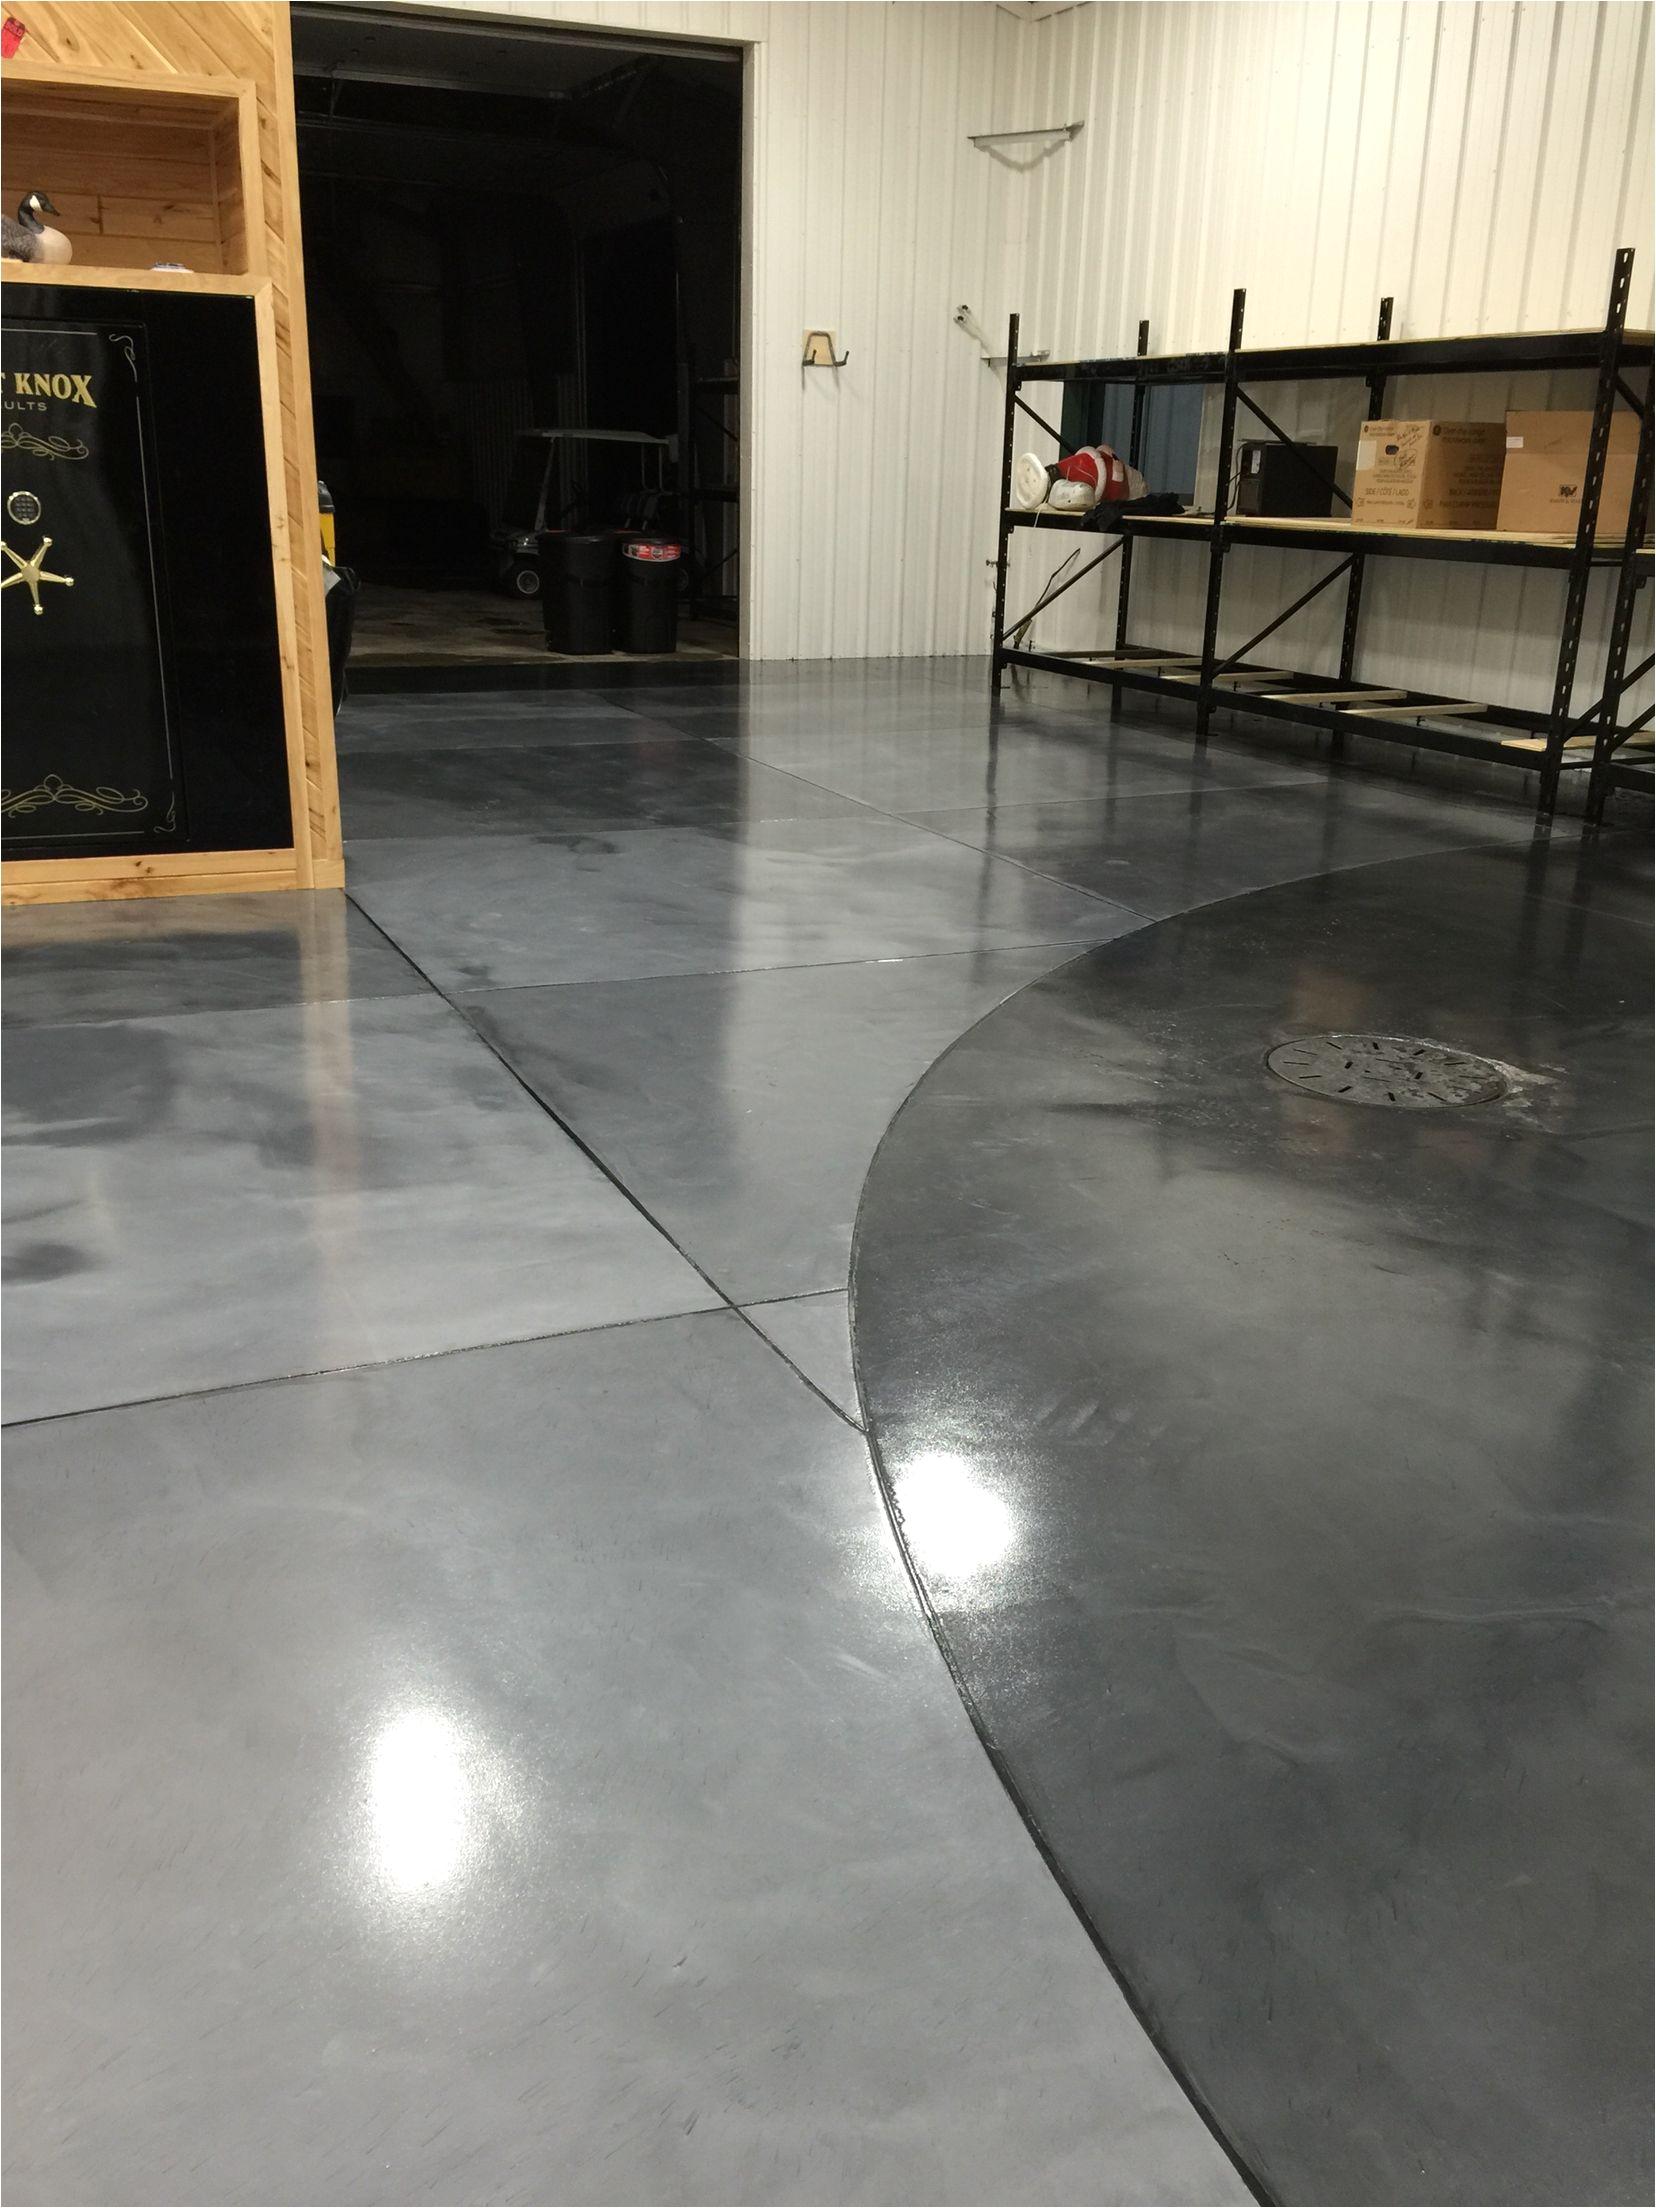 Best Metallic Epoxy Floor Coating Metallic Epoxy Floor Coatings with Epoxy Grout Lines by Sierra